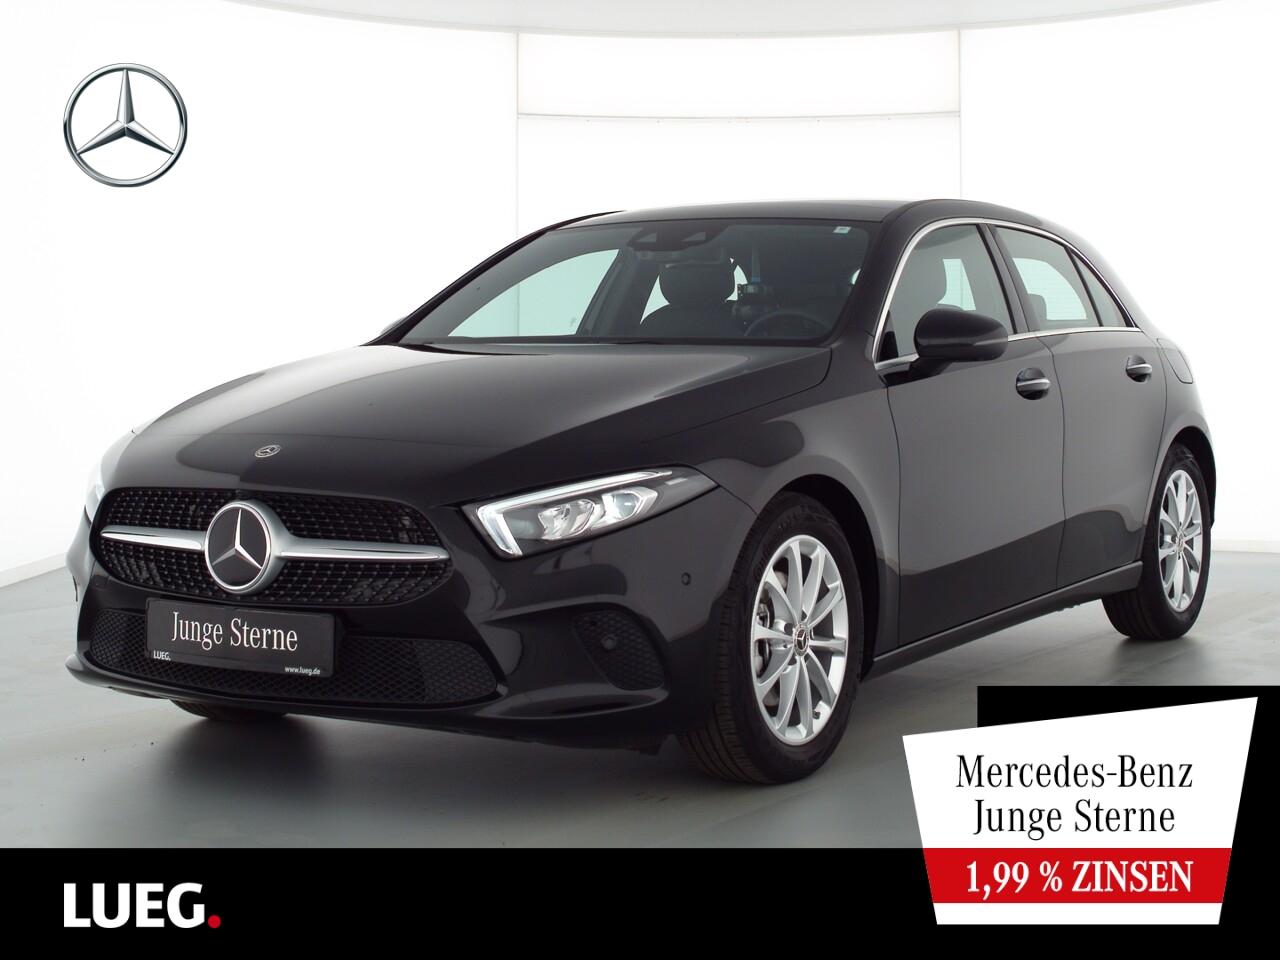 Mercedes-Benz A 200 Progressive+MBUX+NavPrm+Pano+LED+Sthzg+360, Jahr 2020, Benzin